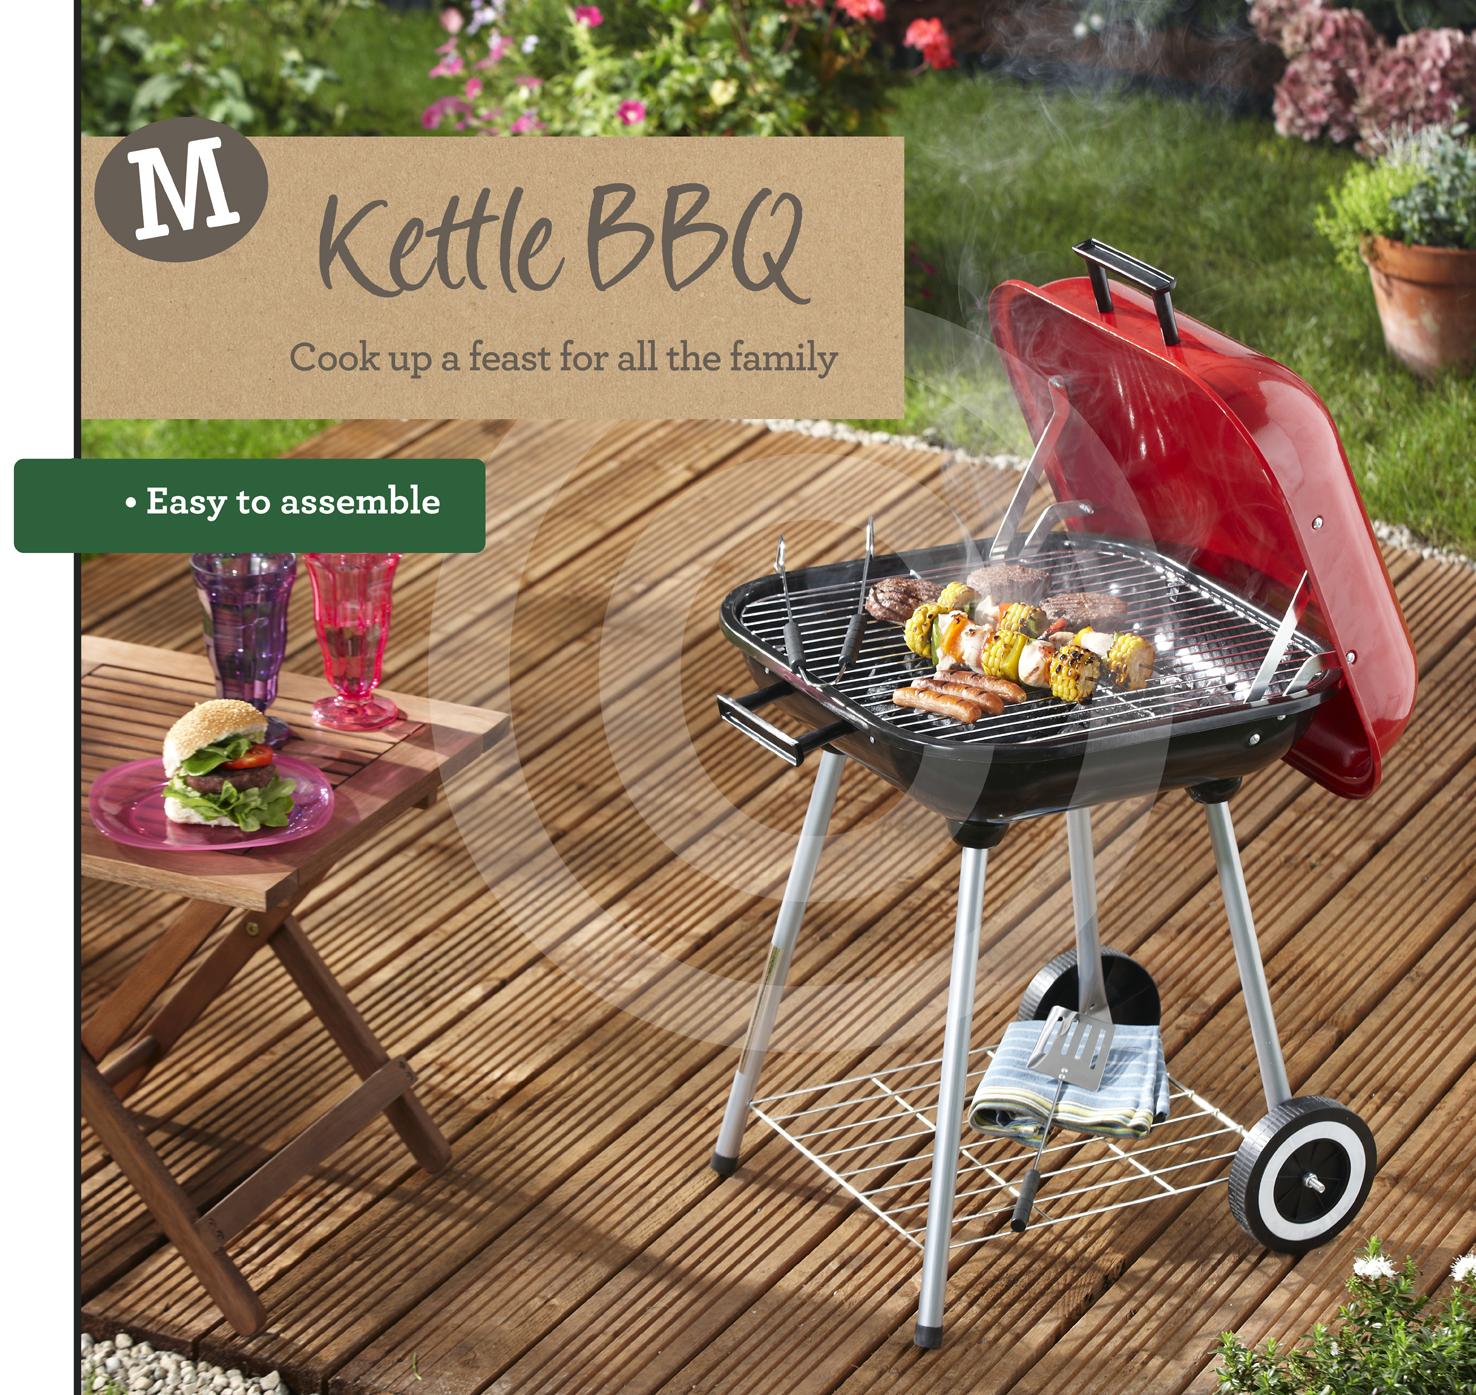 Kettle BBQ2